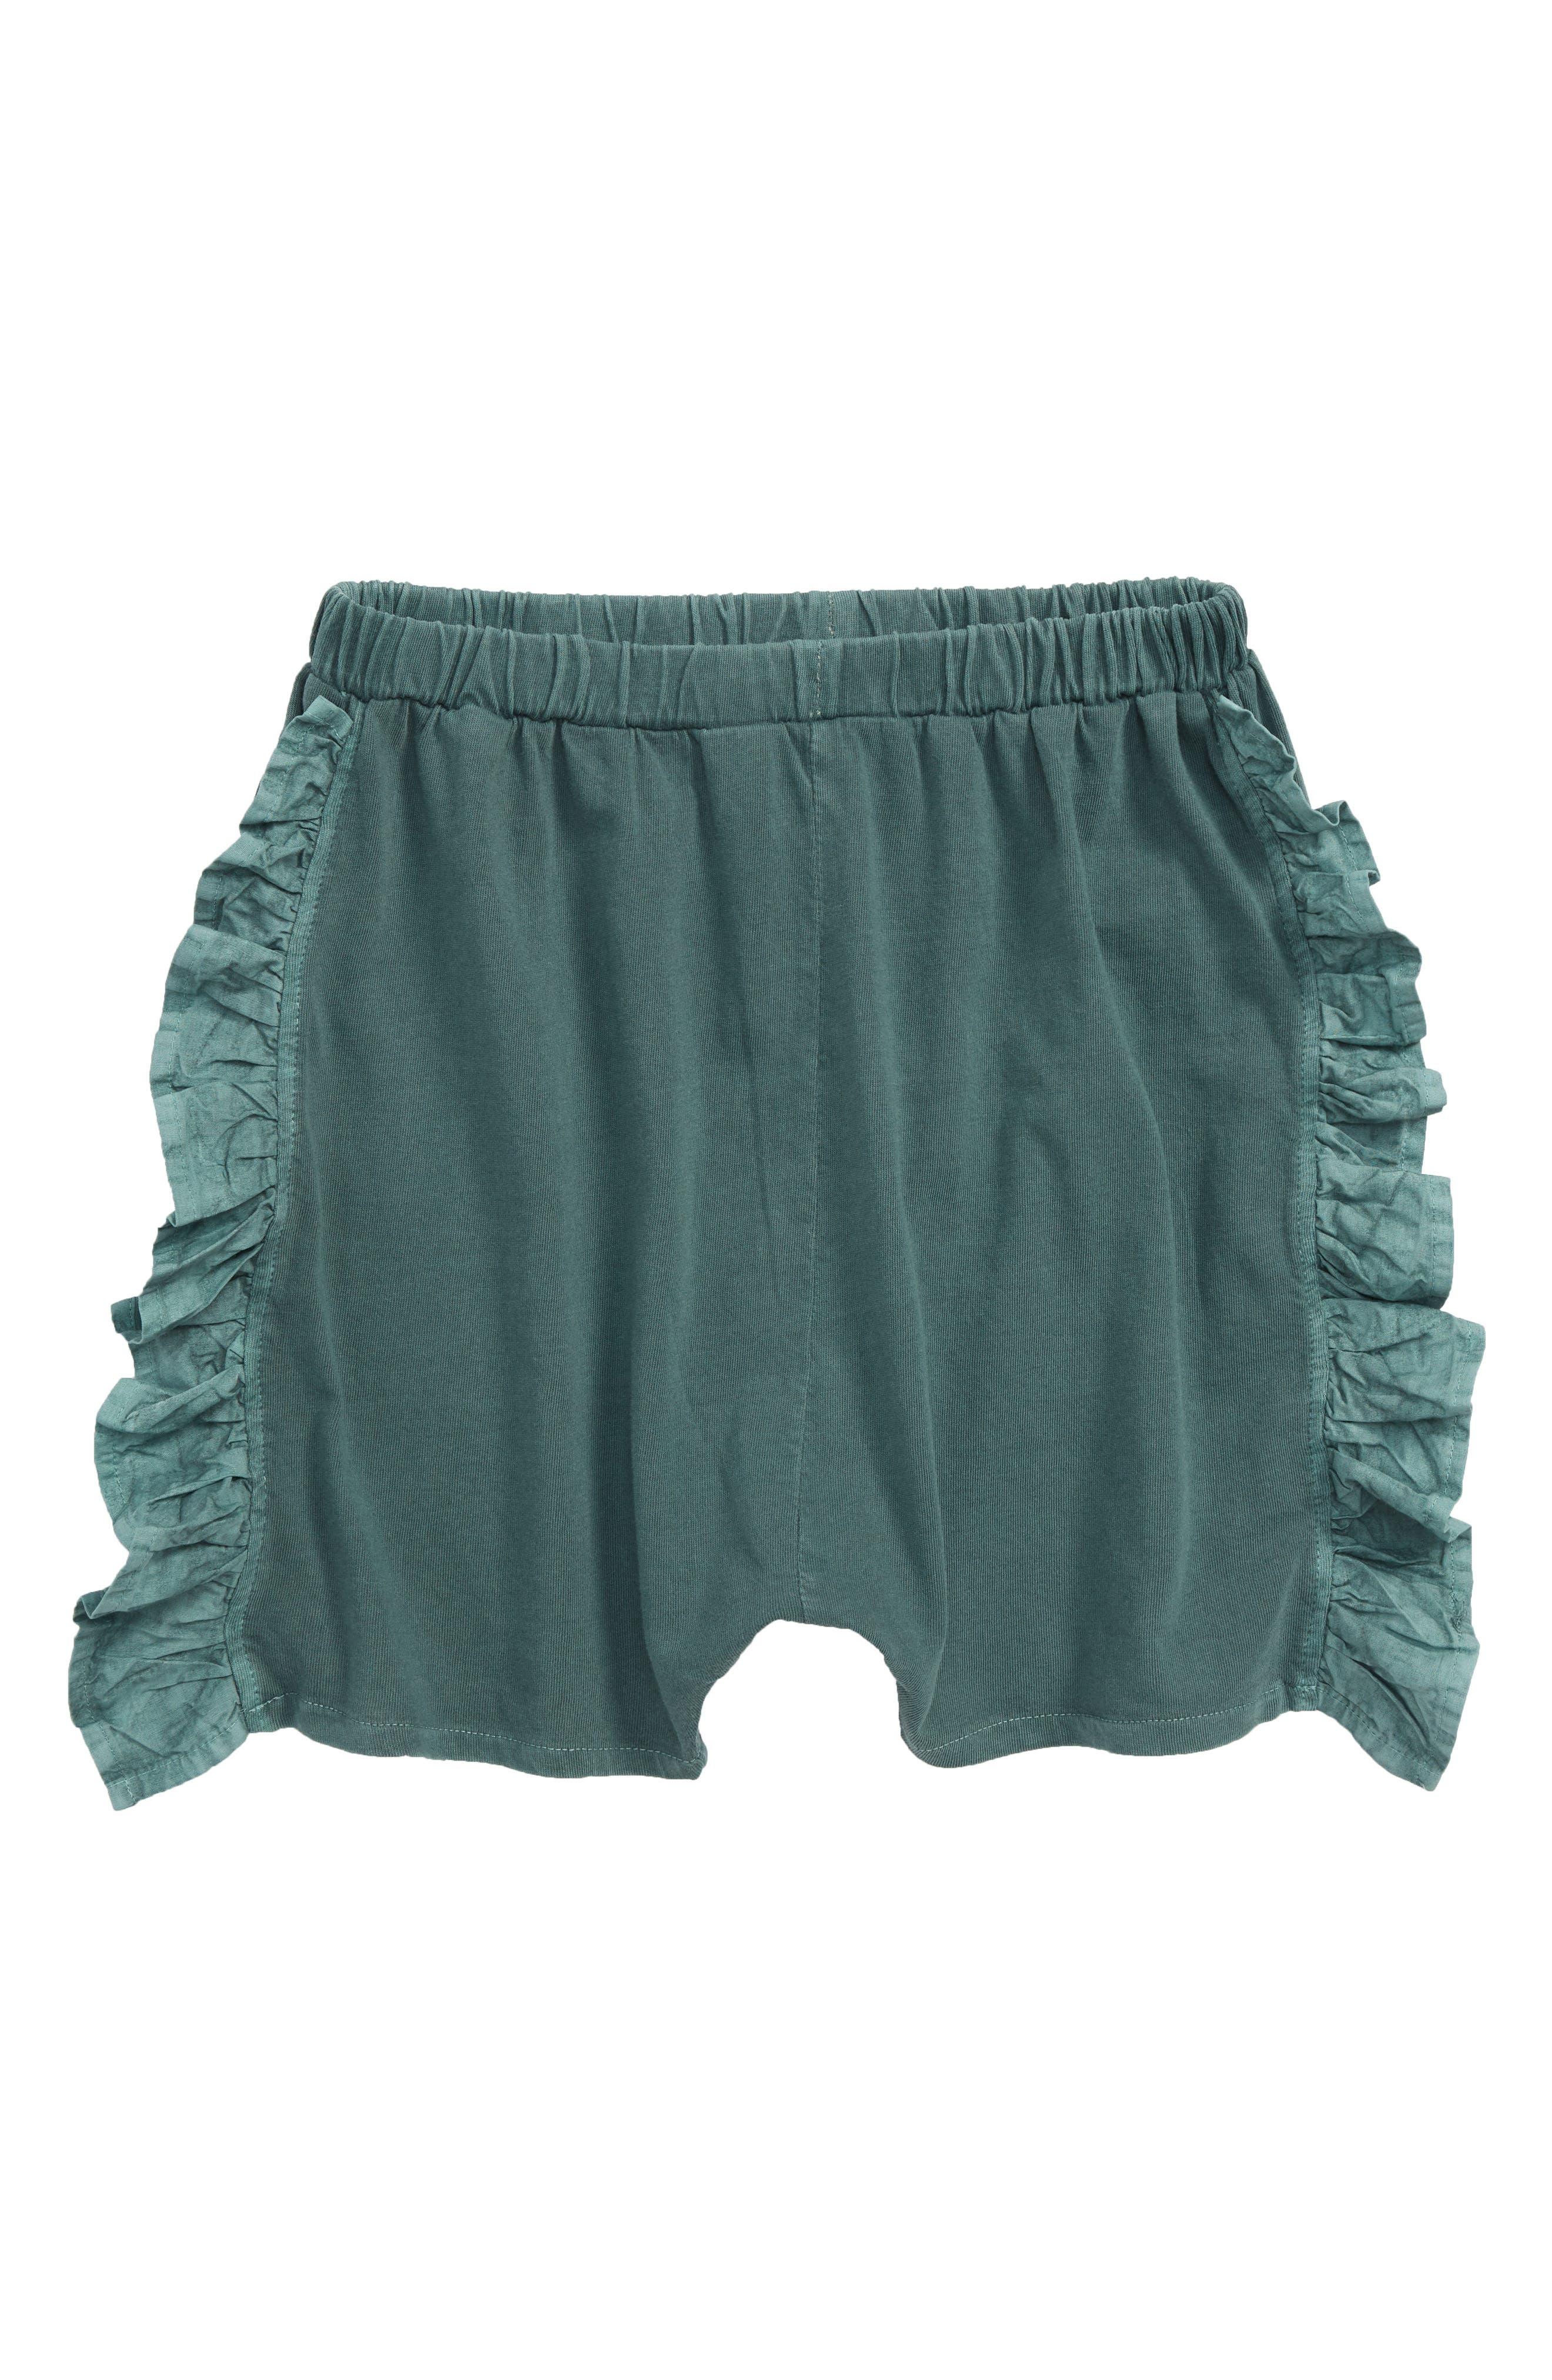 Ruffle Knit Short,                         Main,                         color, 301